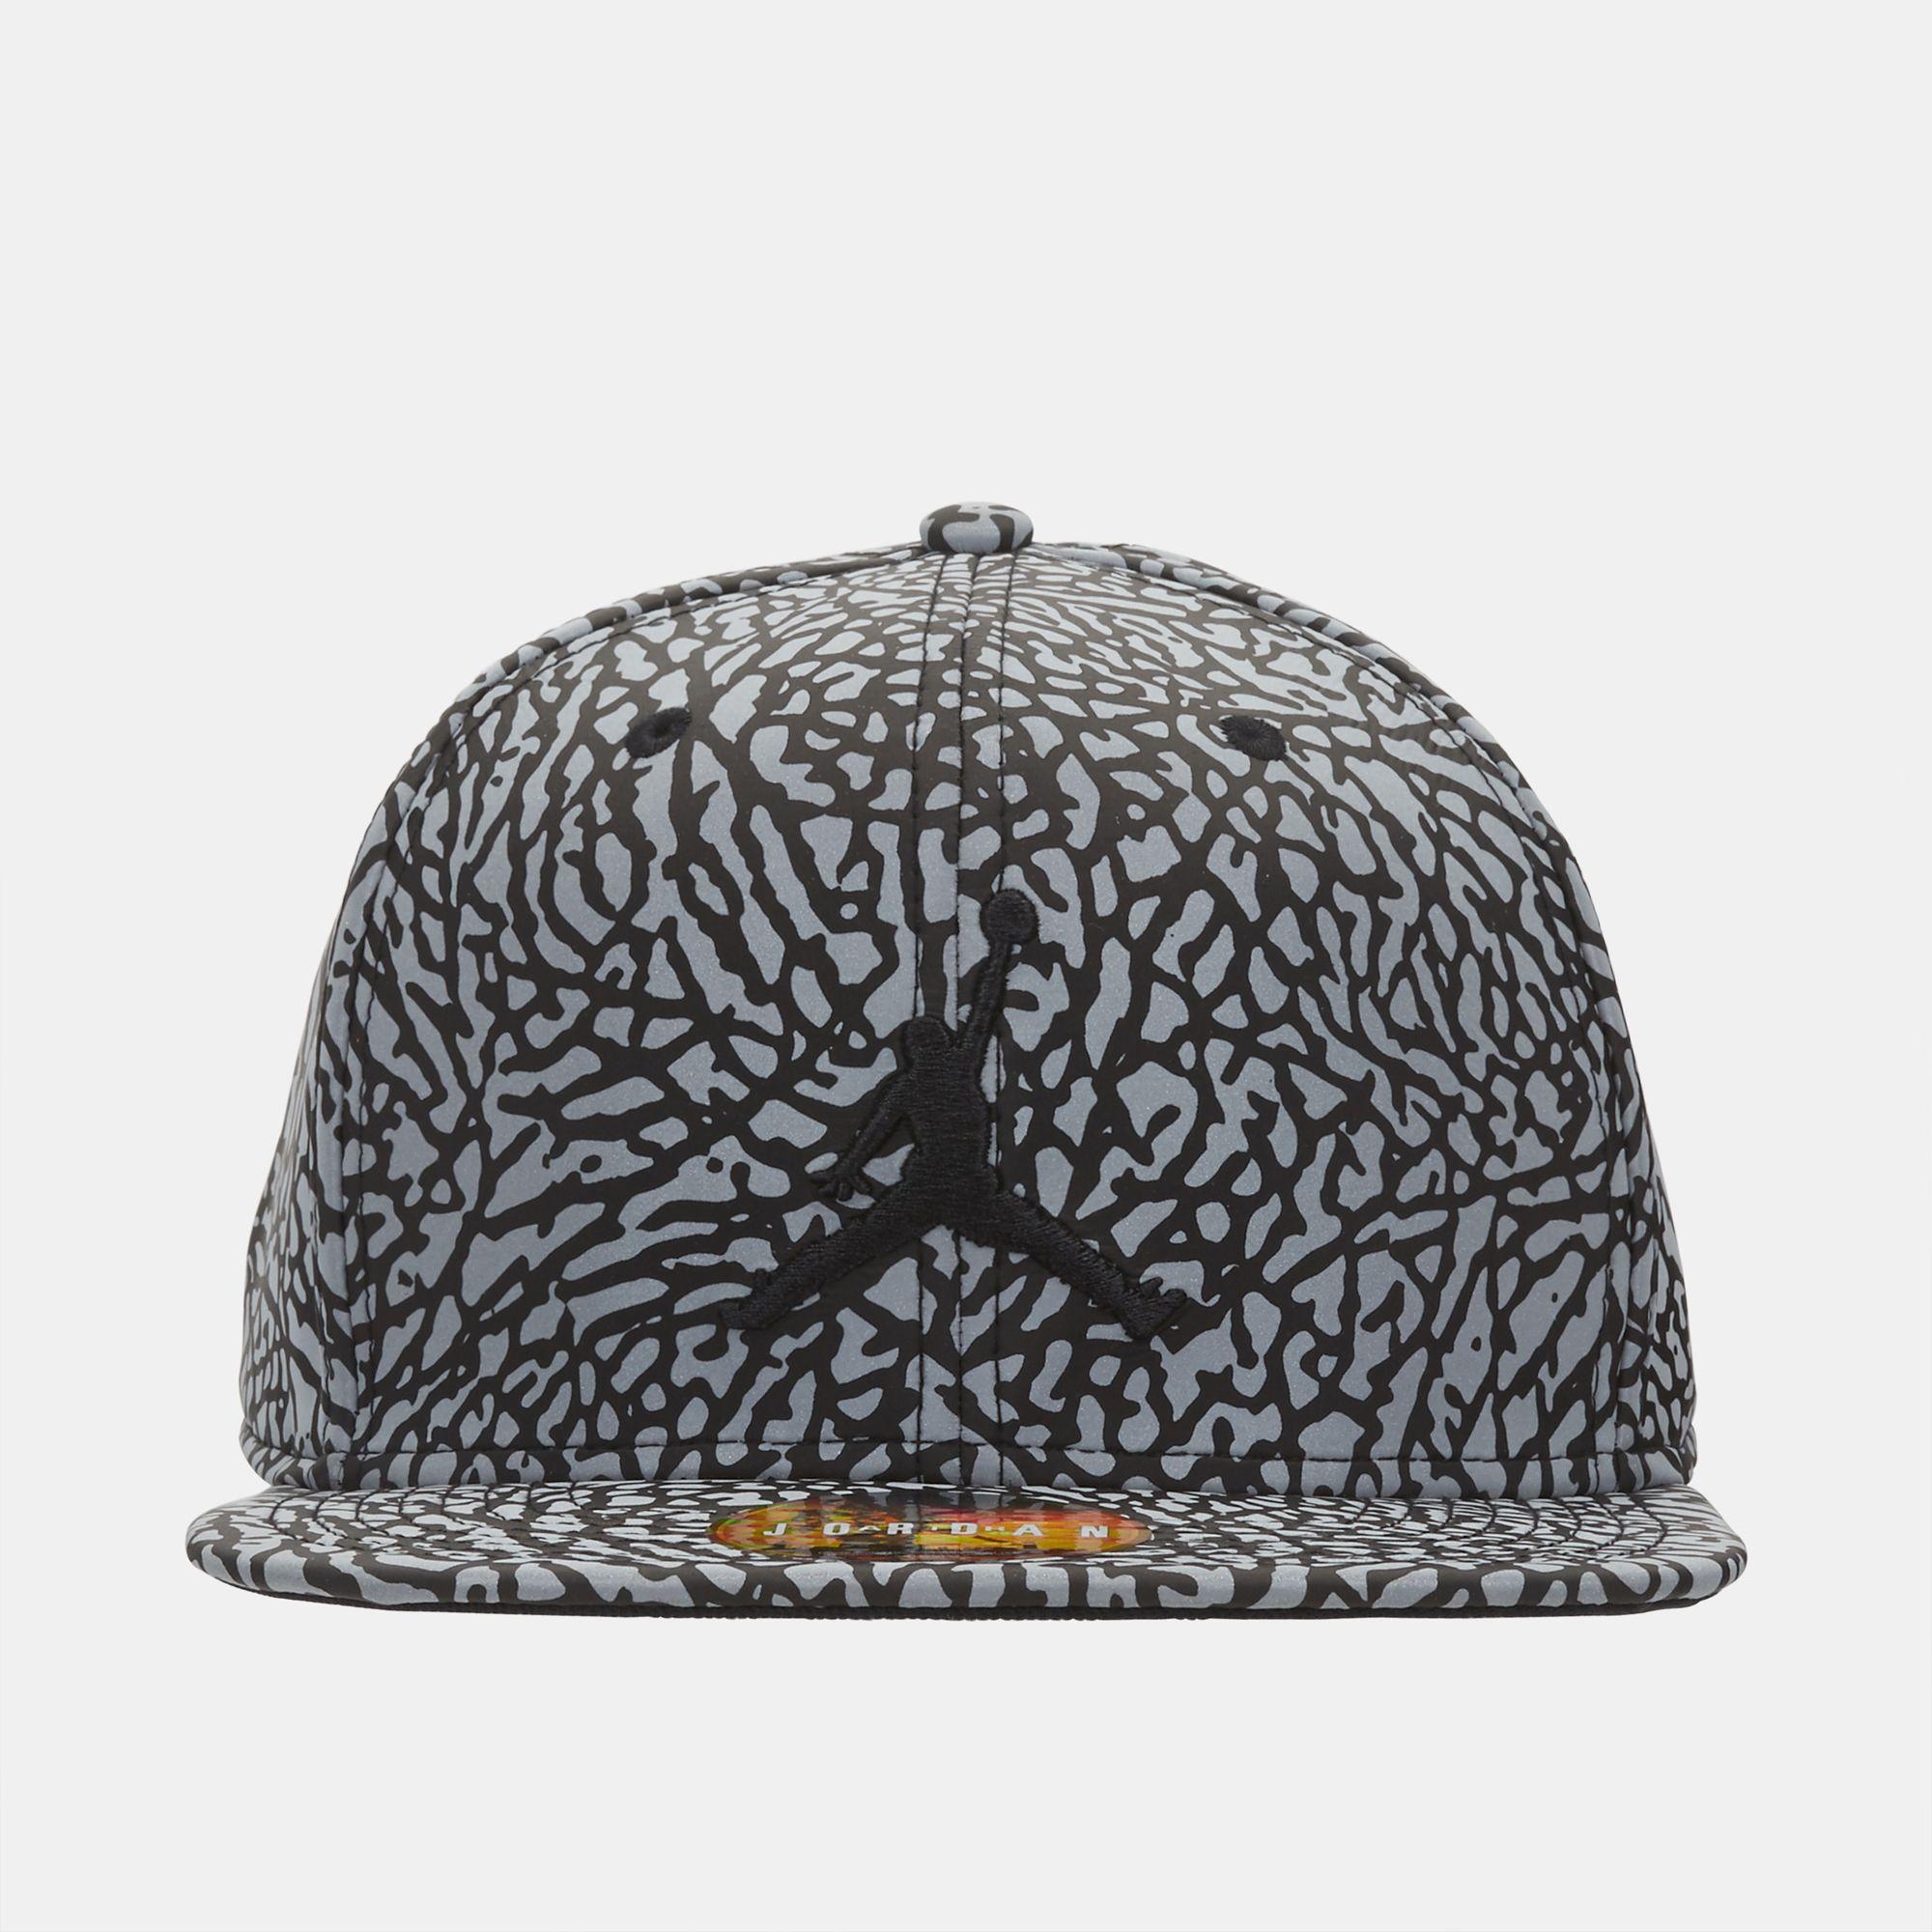 a5bb38065ef Shop Black Jordan Reflective Elephant Print Snapback Cap for Mens by ...